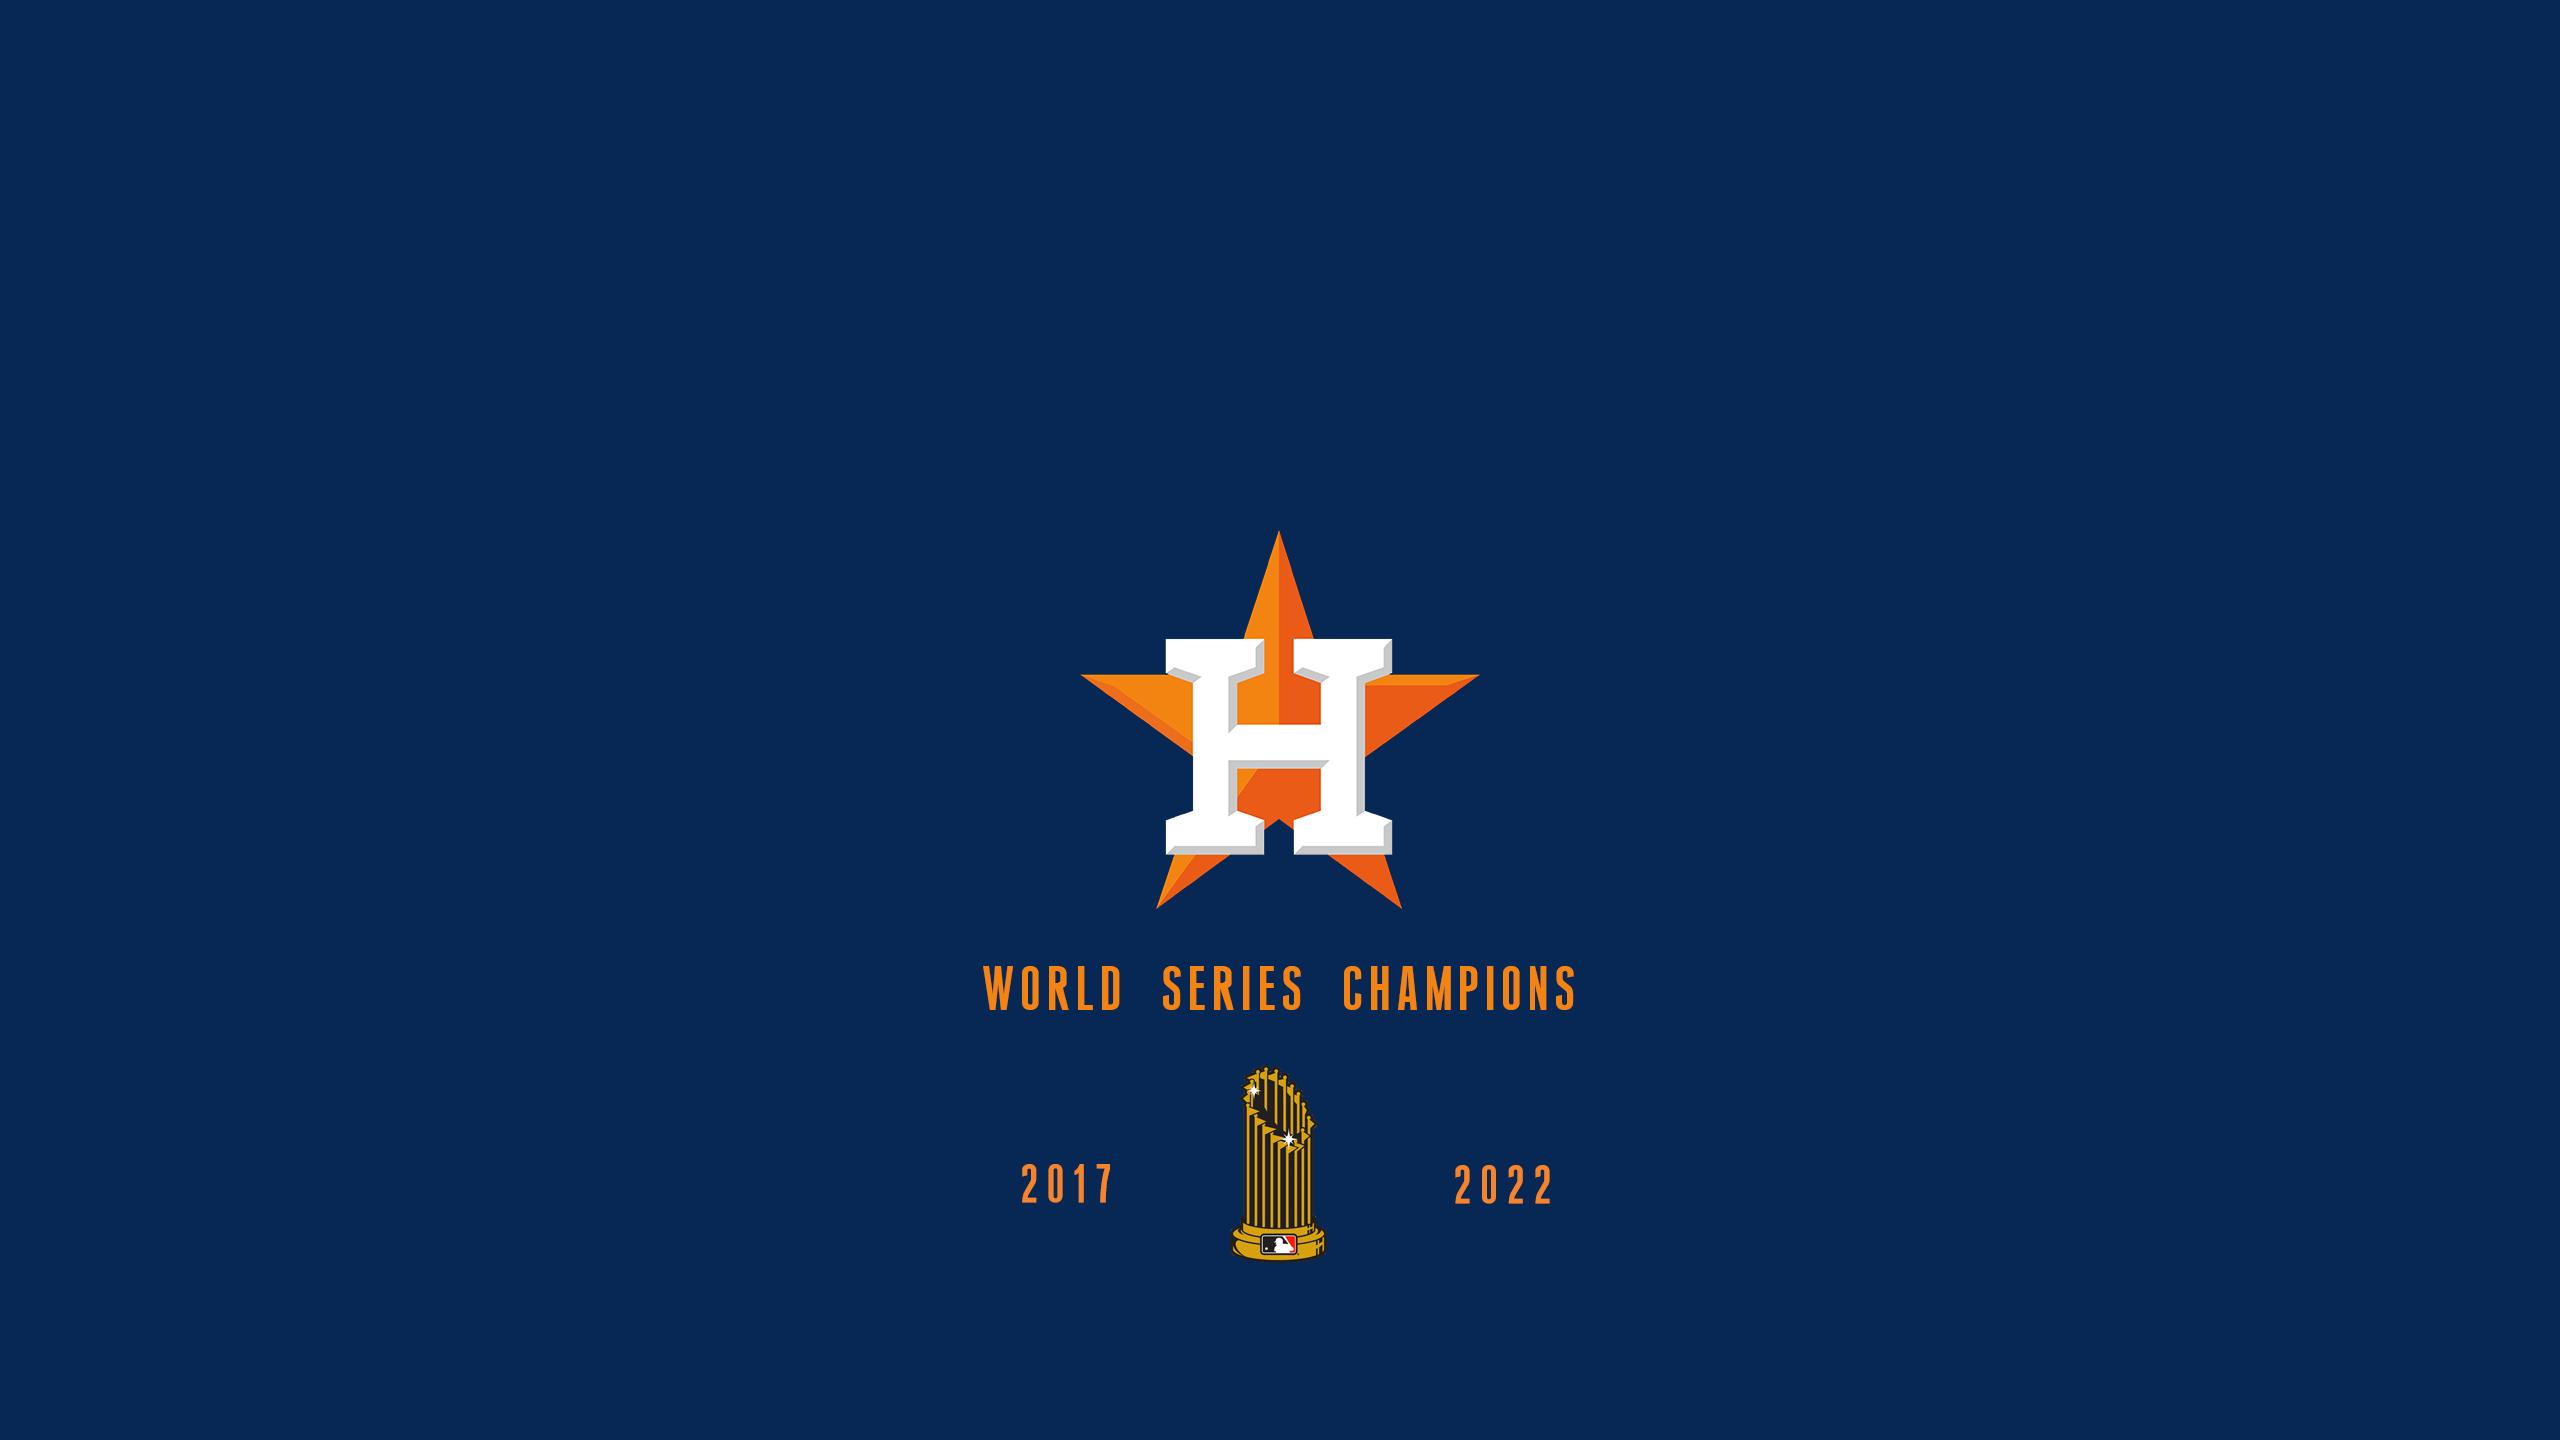 Houston Astros - World Series Champs